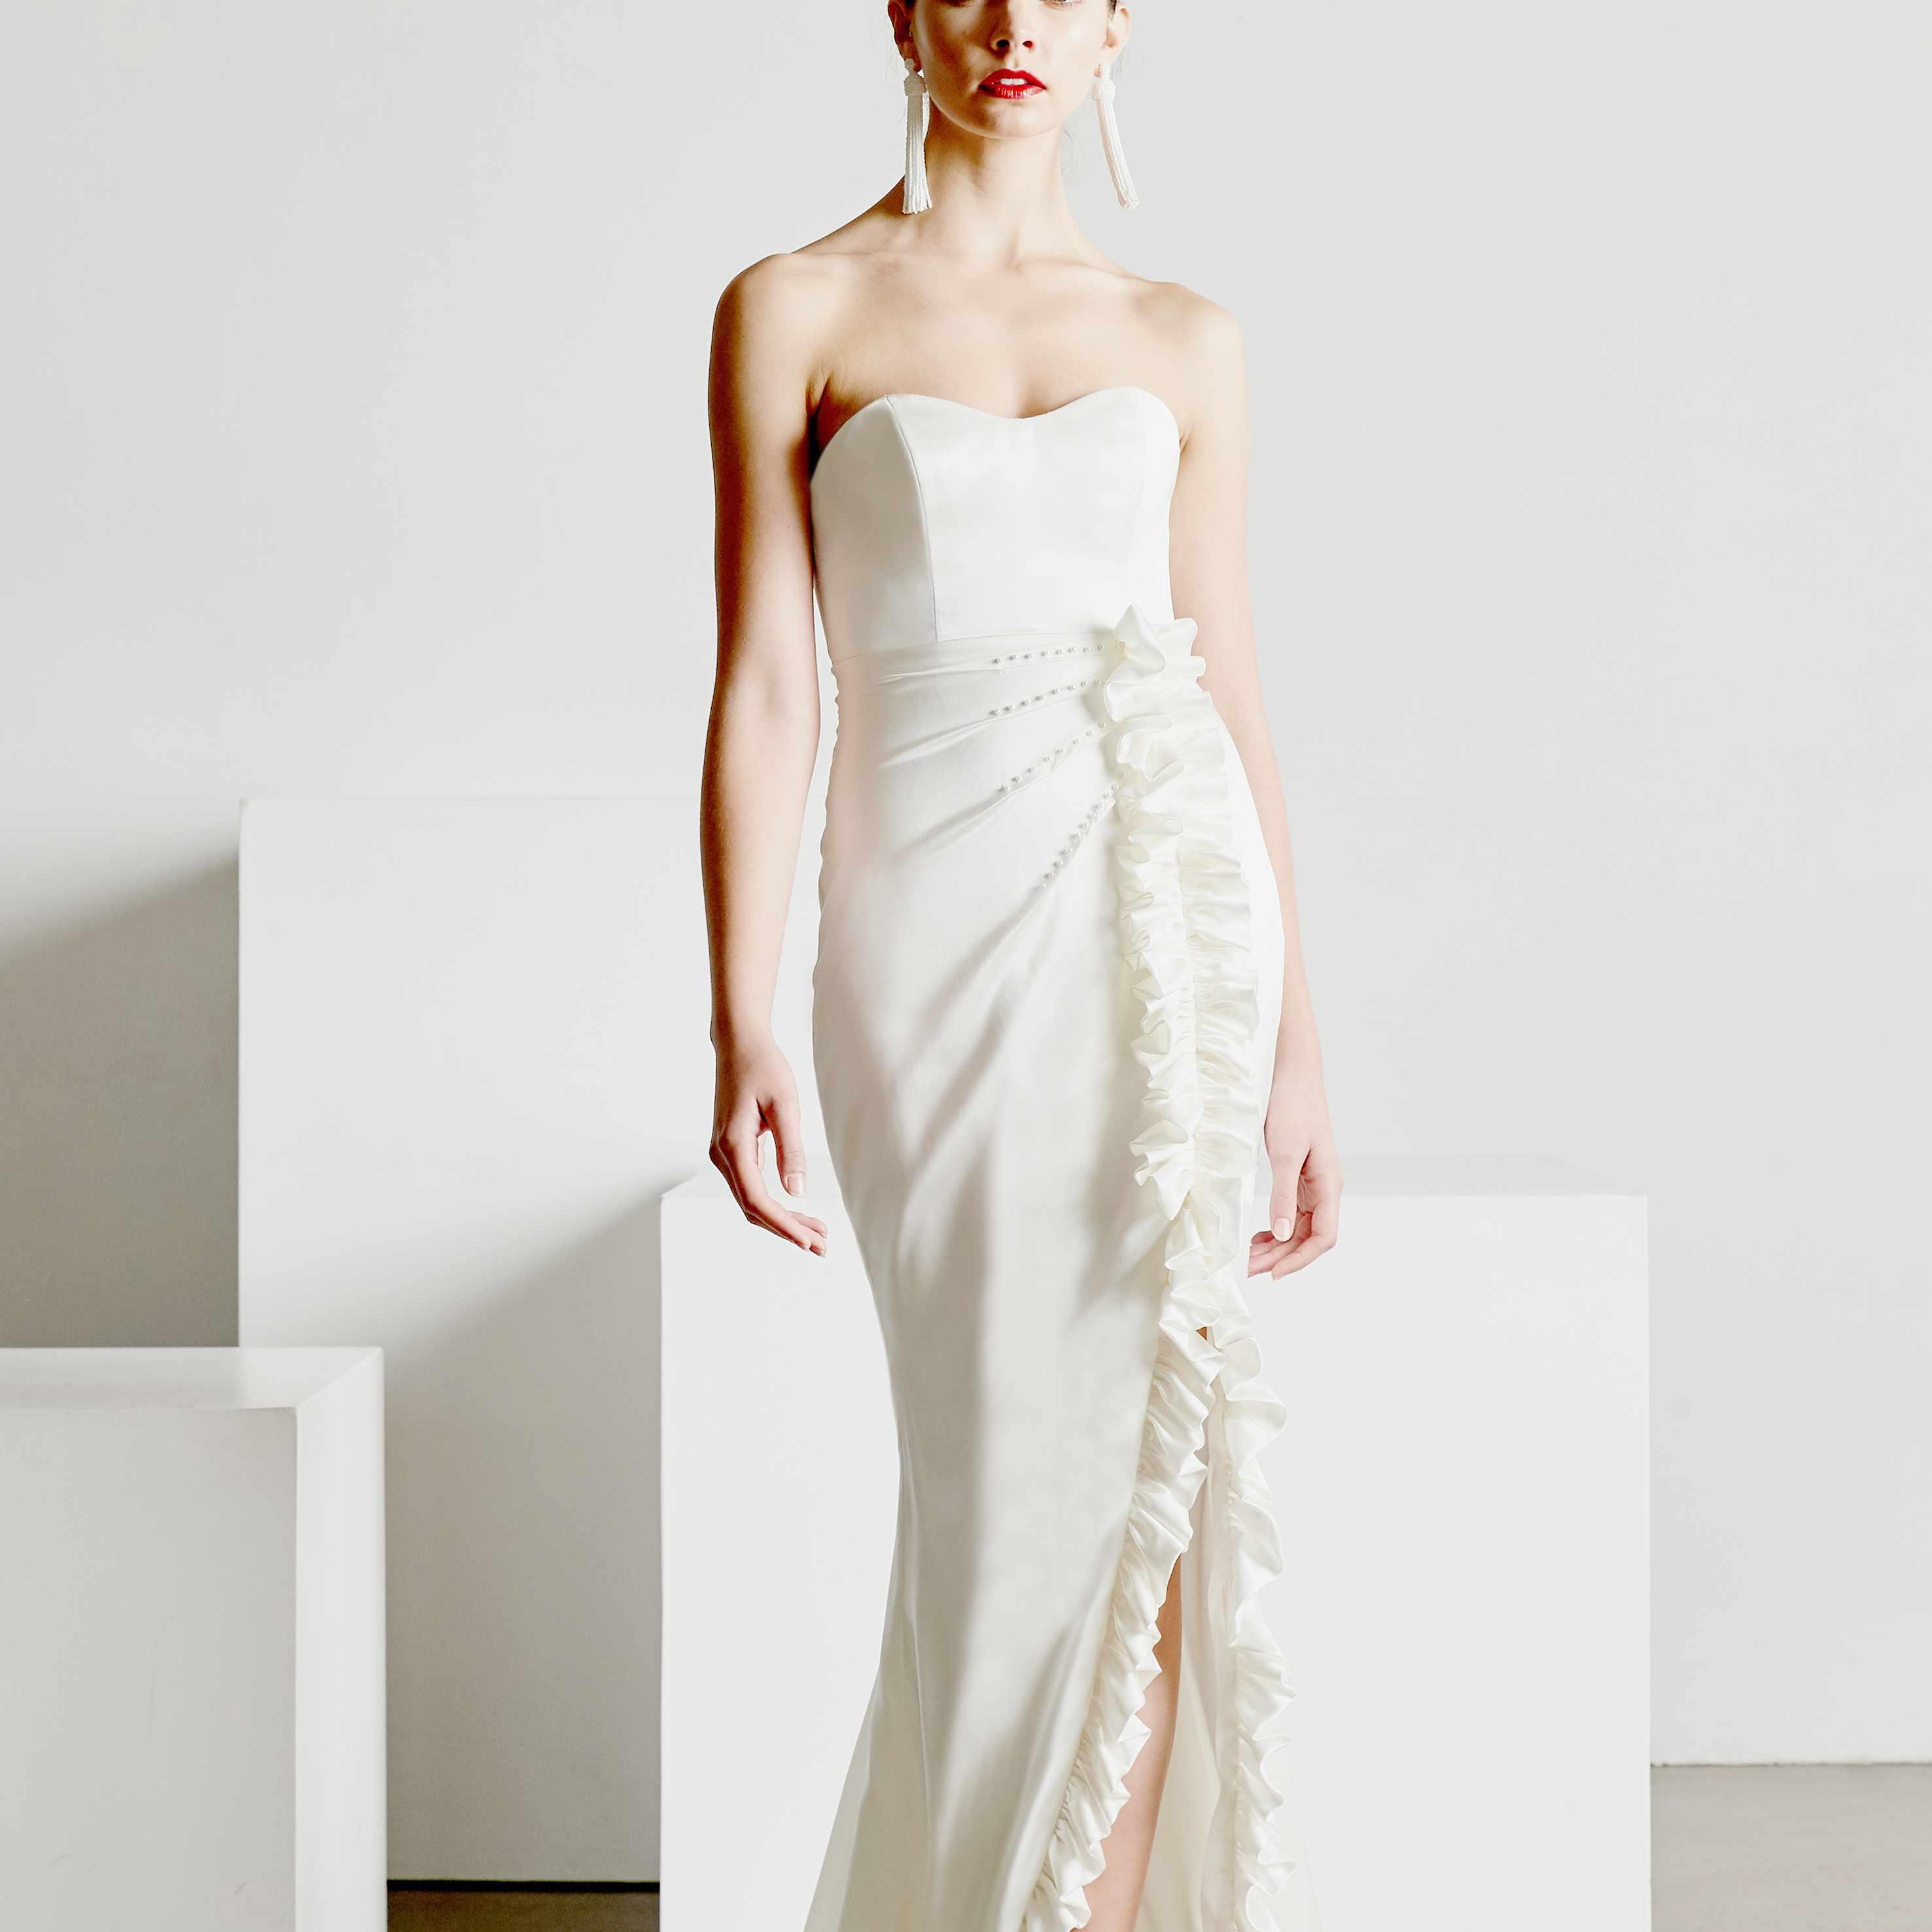 Gallery New Mira Zwillinger Wedding Dresses Spring 2019: Sébastien Luke Bridal Spring 2019